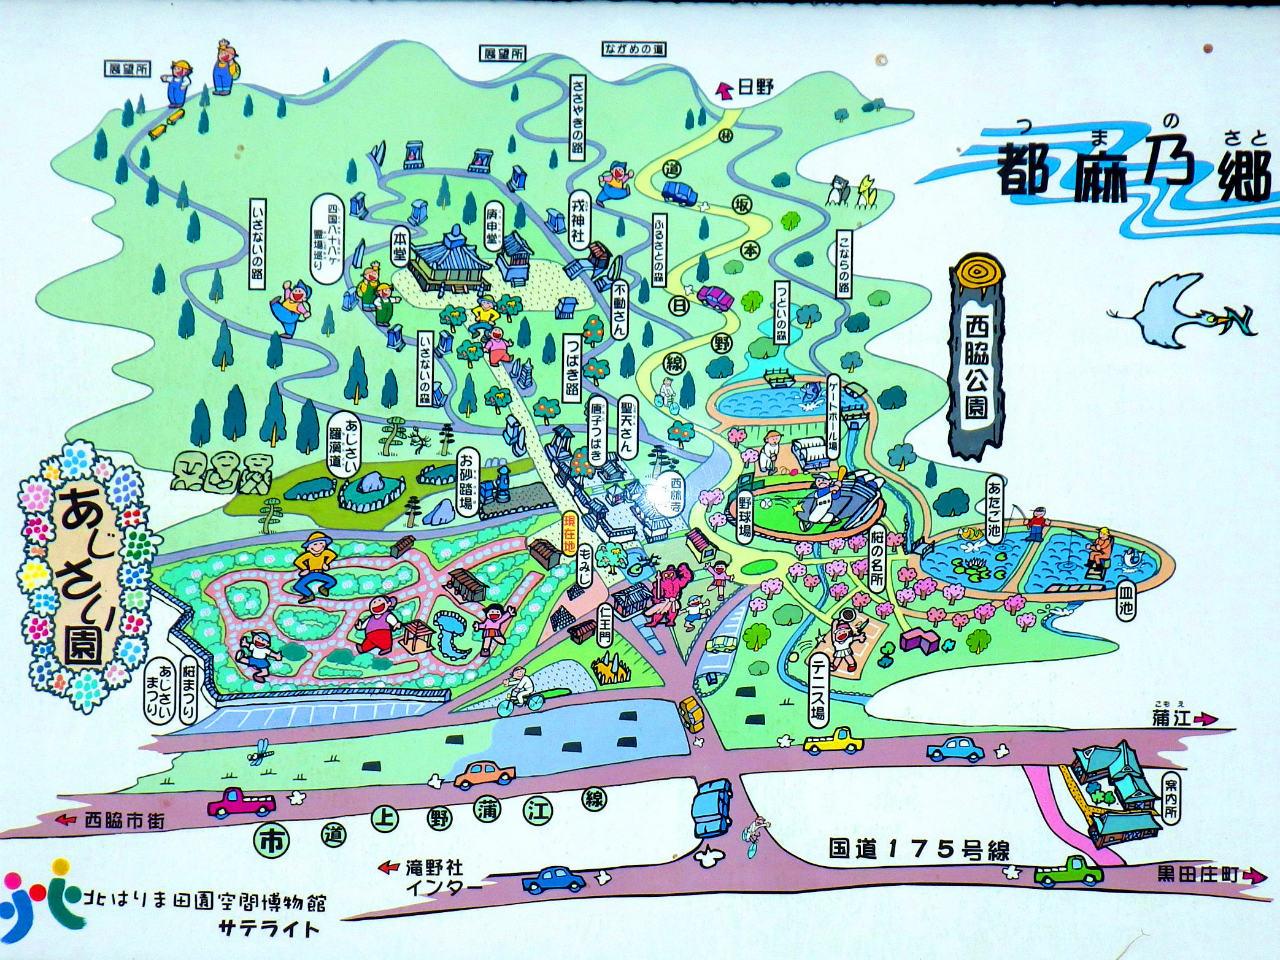 02b 西林寺周辺のマップ